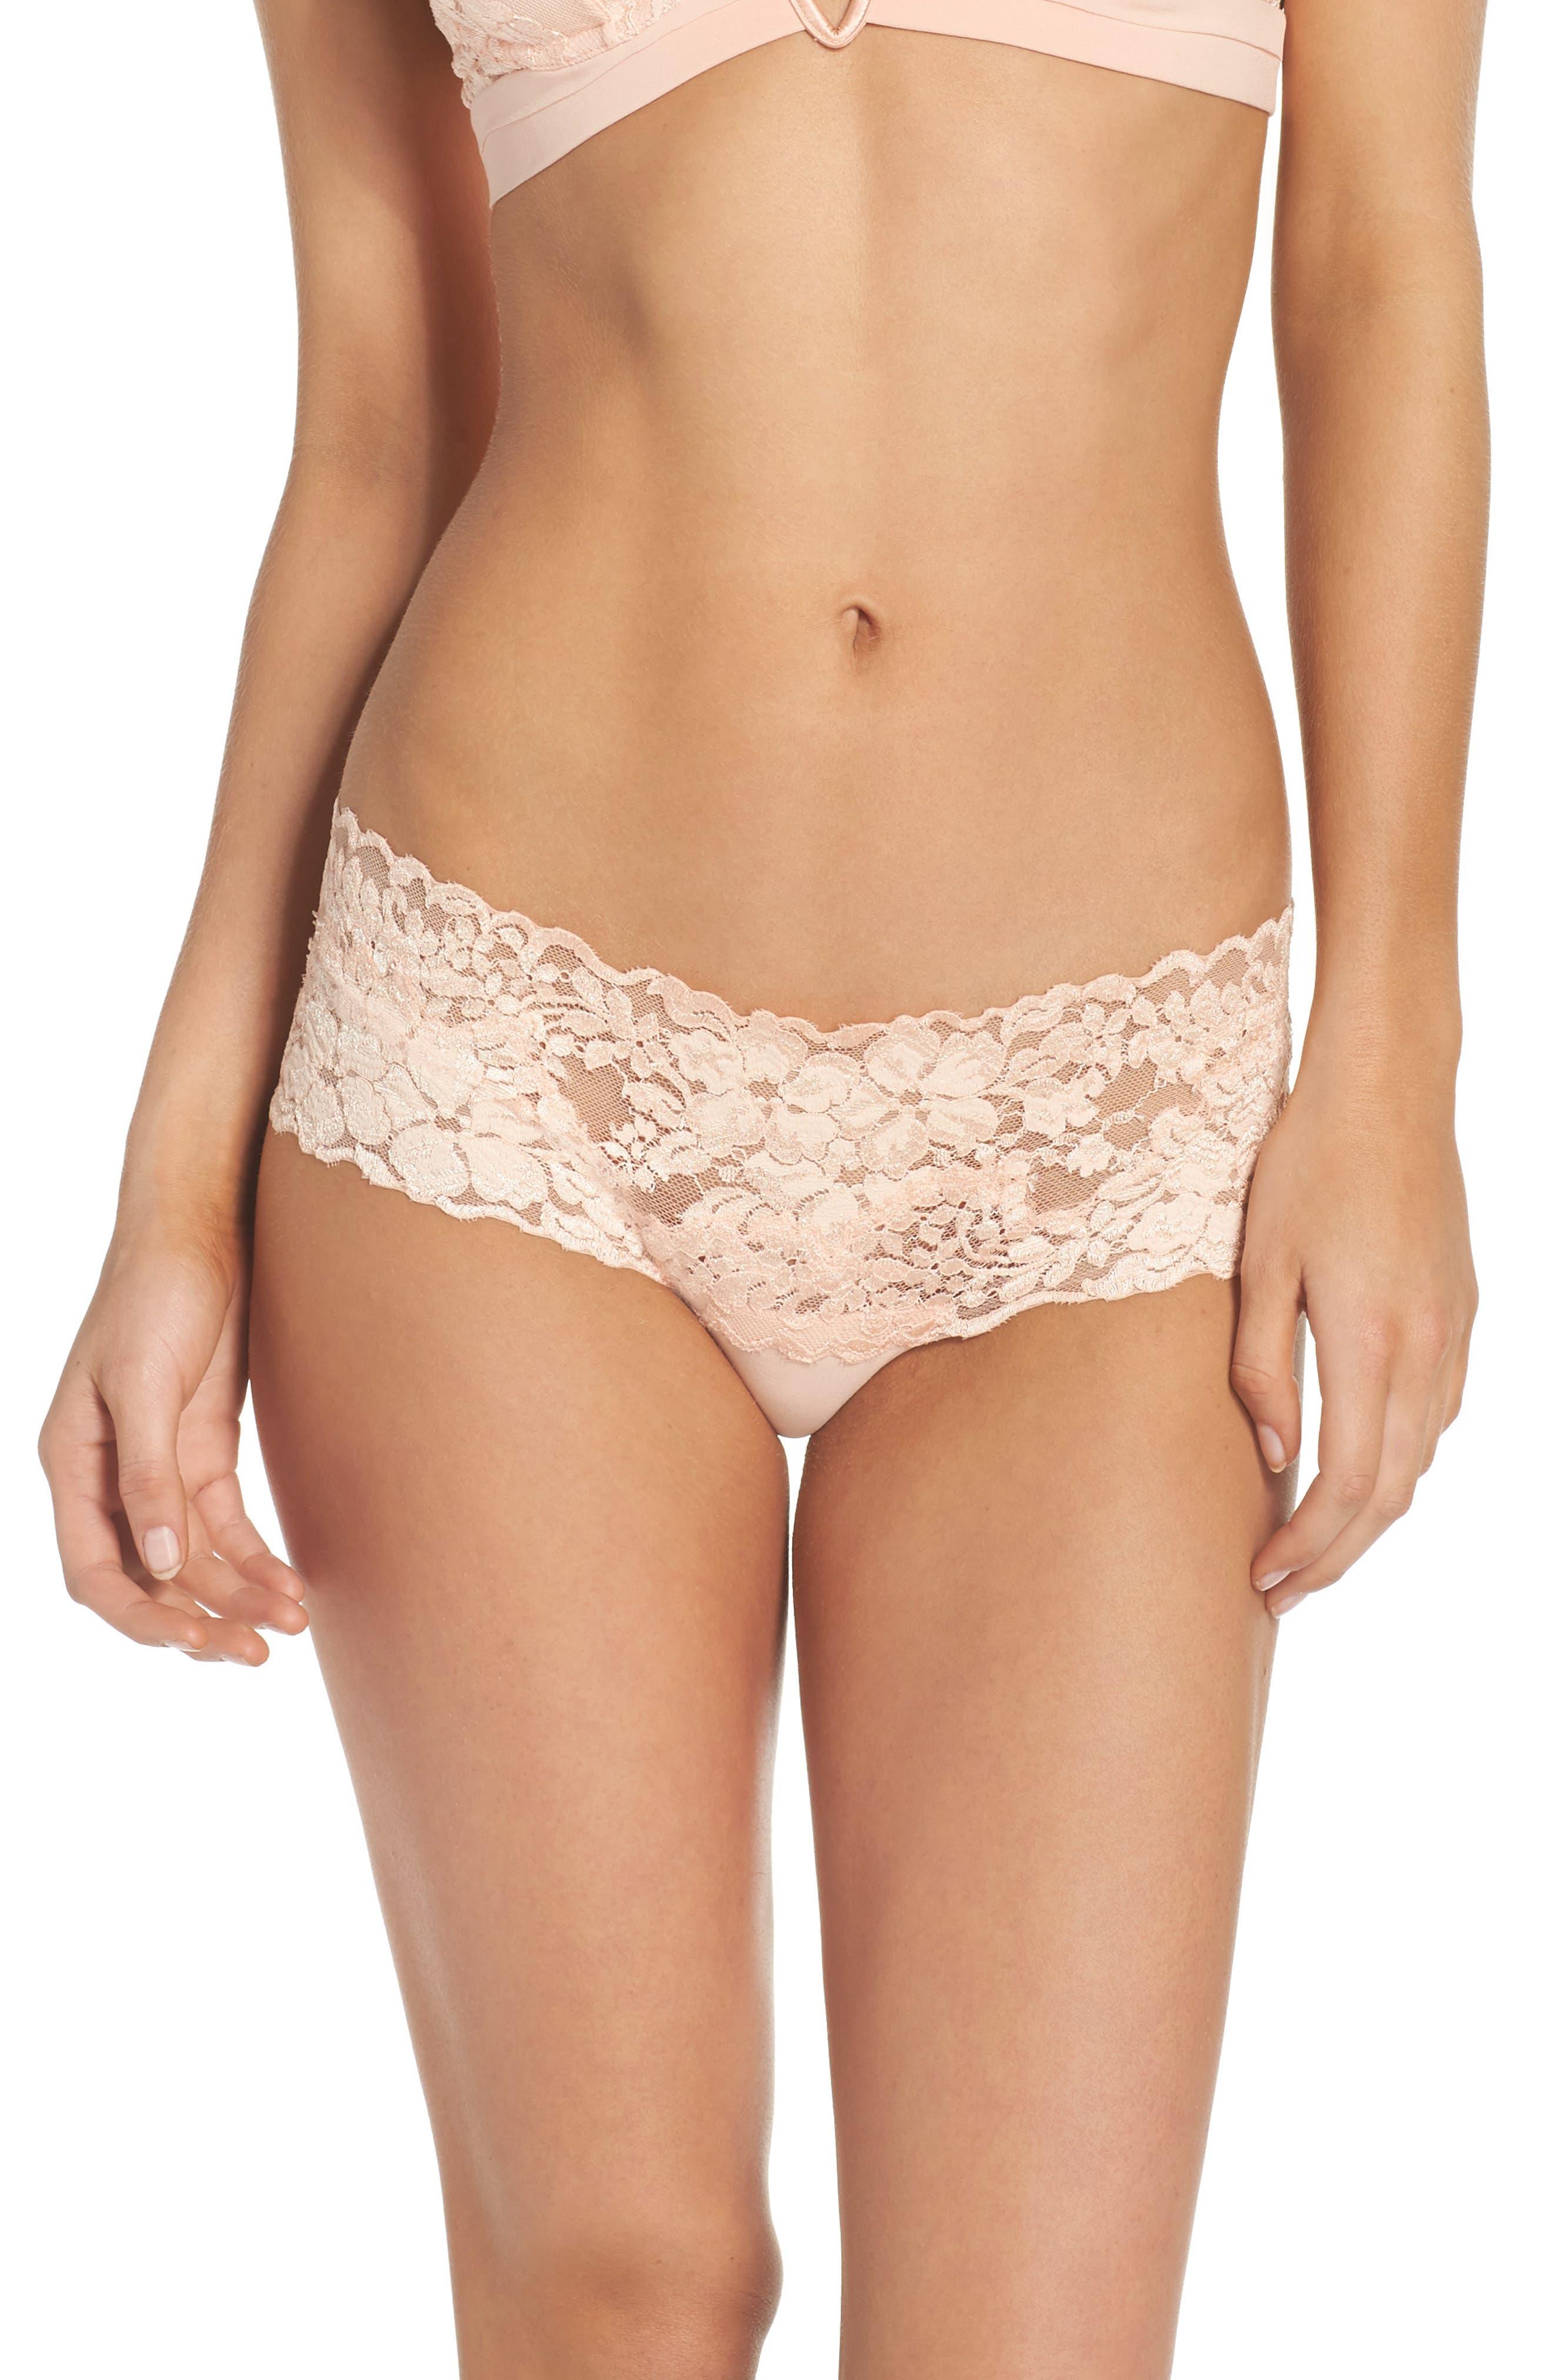 Main Image - La Perla Azalea Hipster Panties